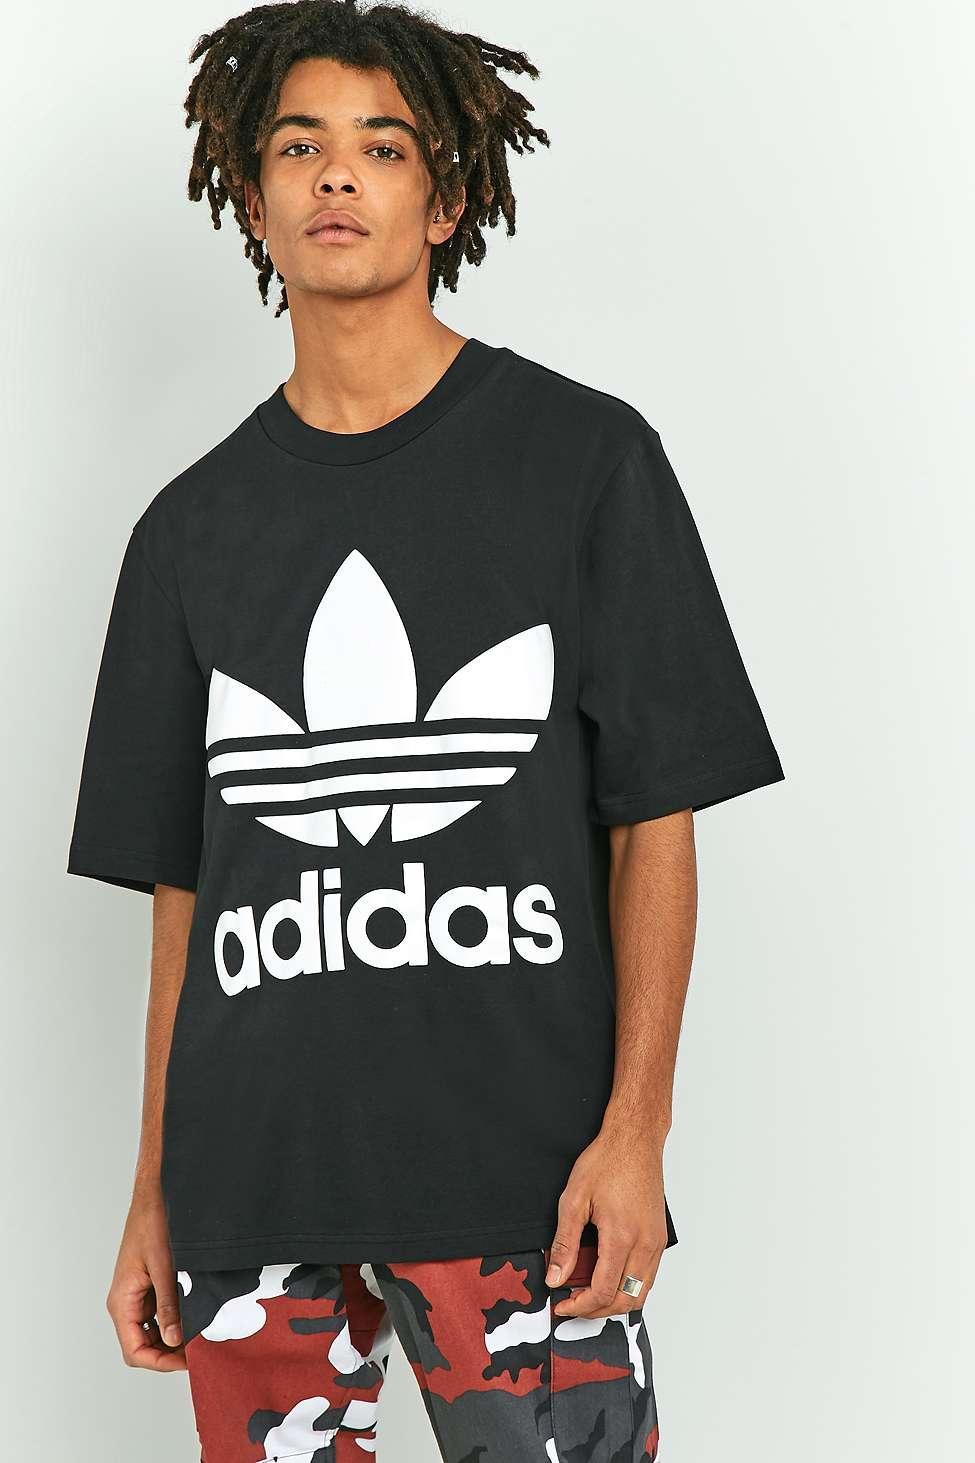 adidas adicolor nero quella t - shirt urban outfitters